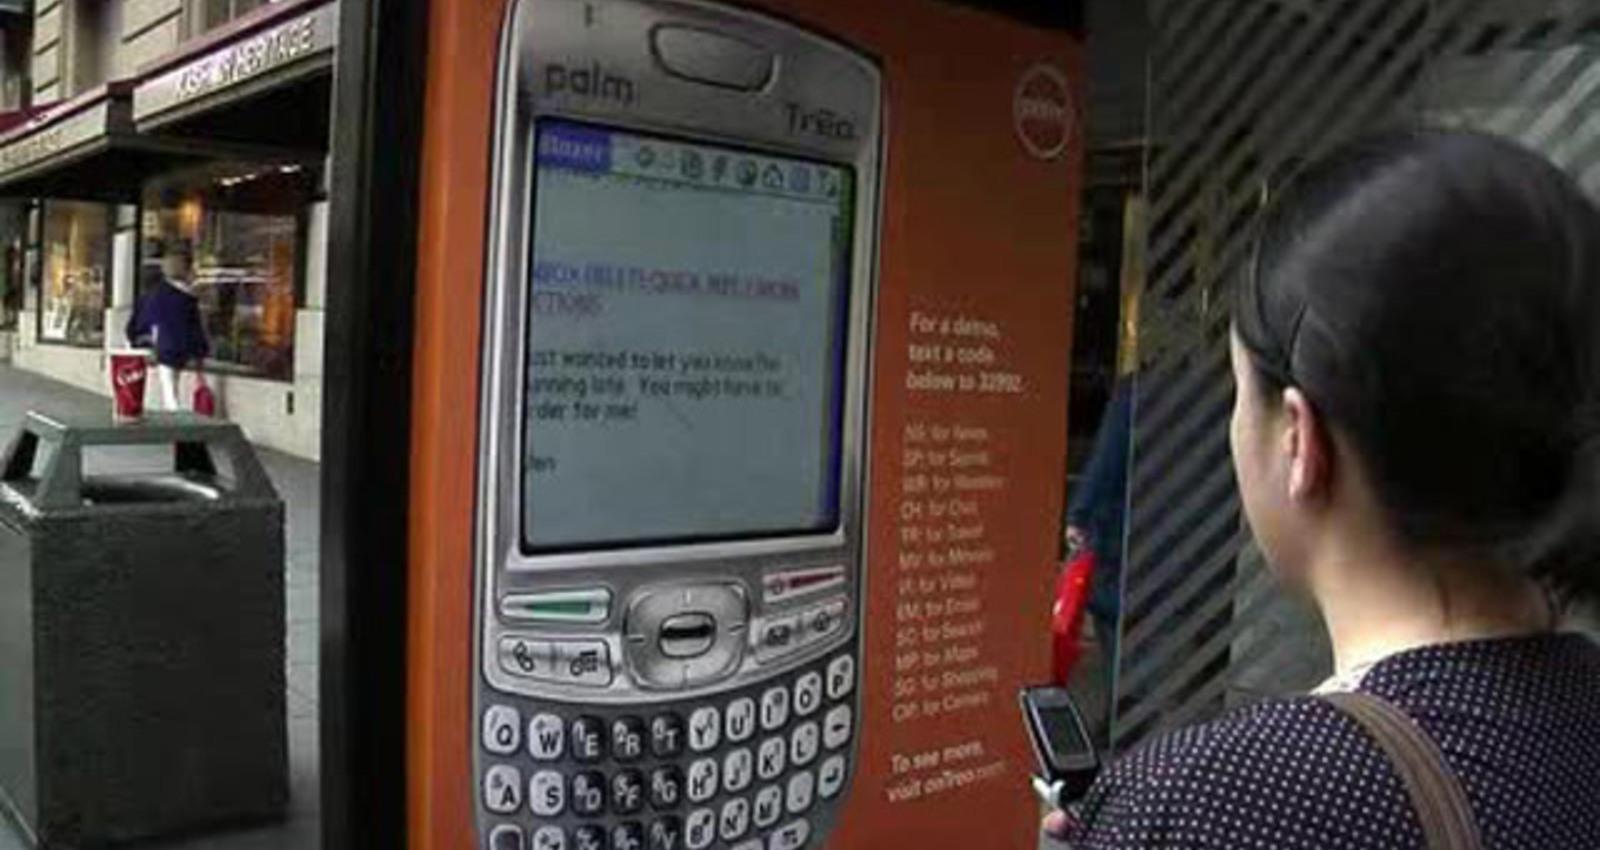 Palm Treo 680 Launch